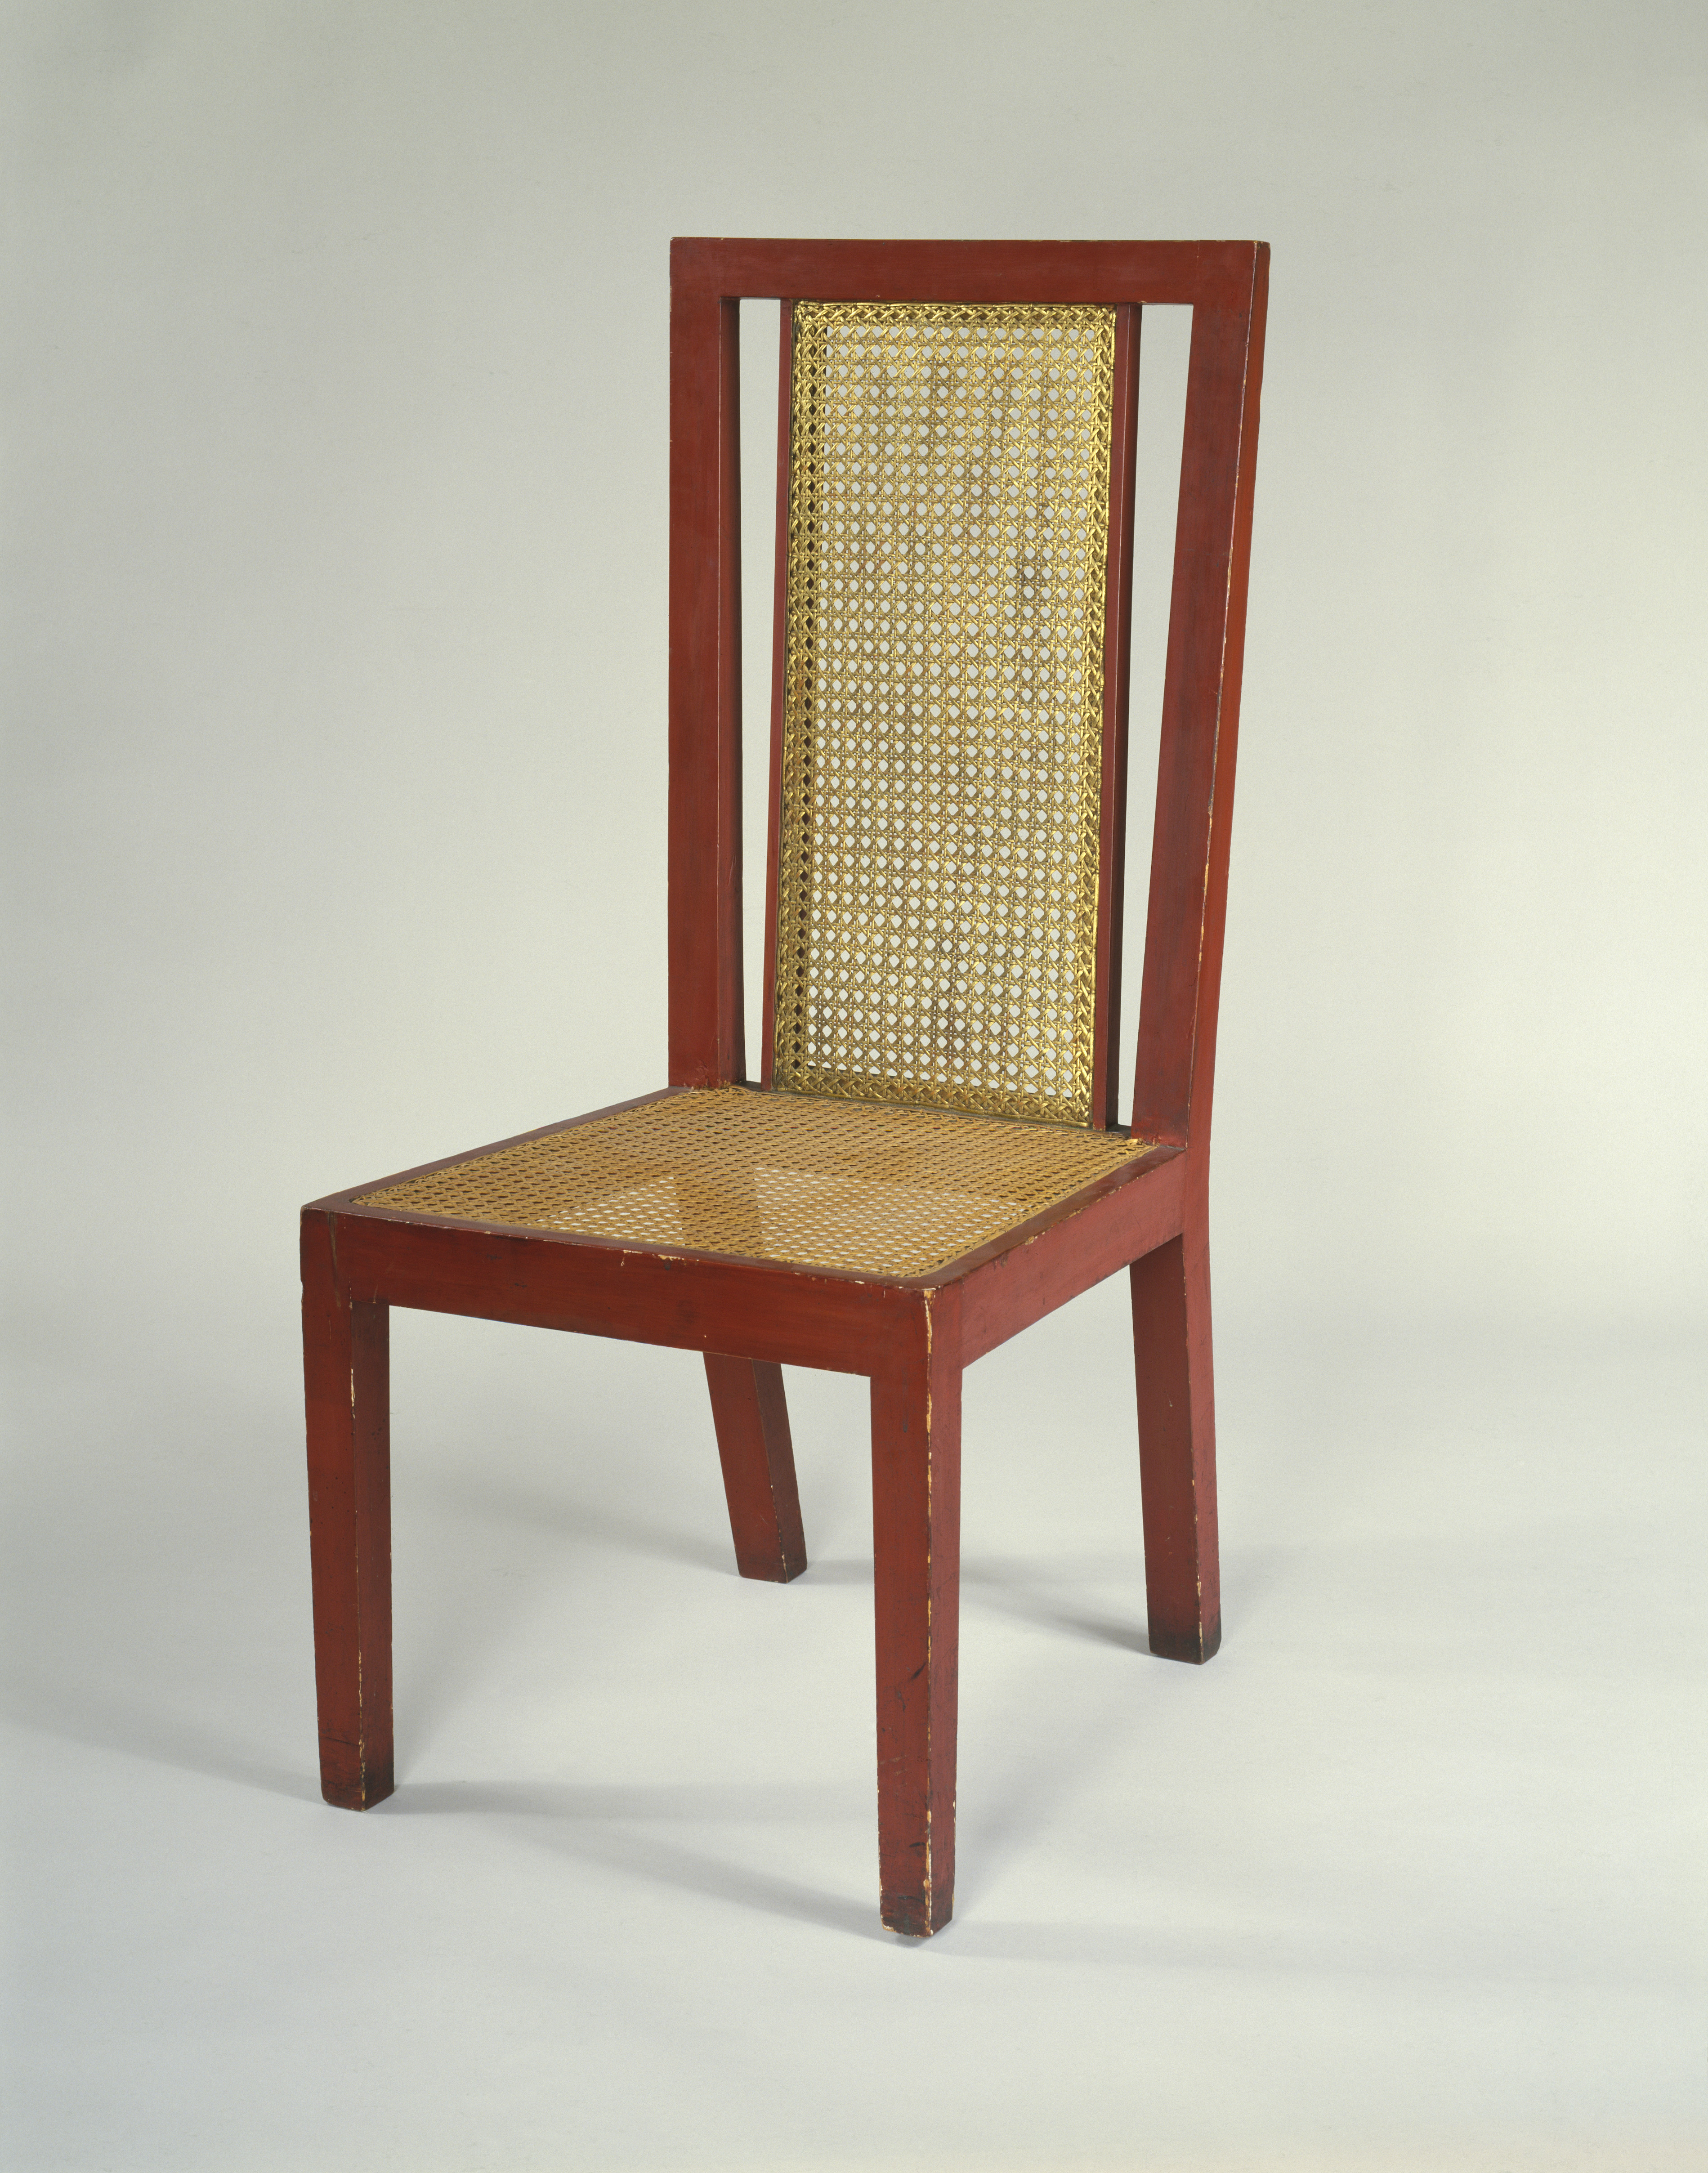 1 Fry - 1913, Chair for Dryad Furniture for Omega Workshop